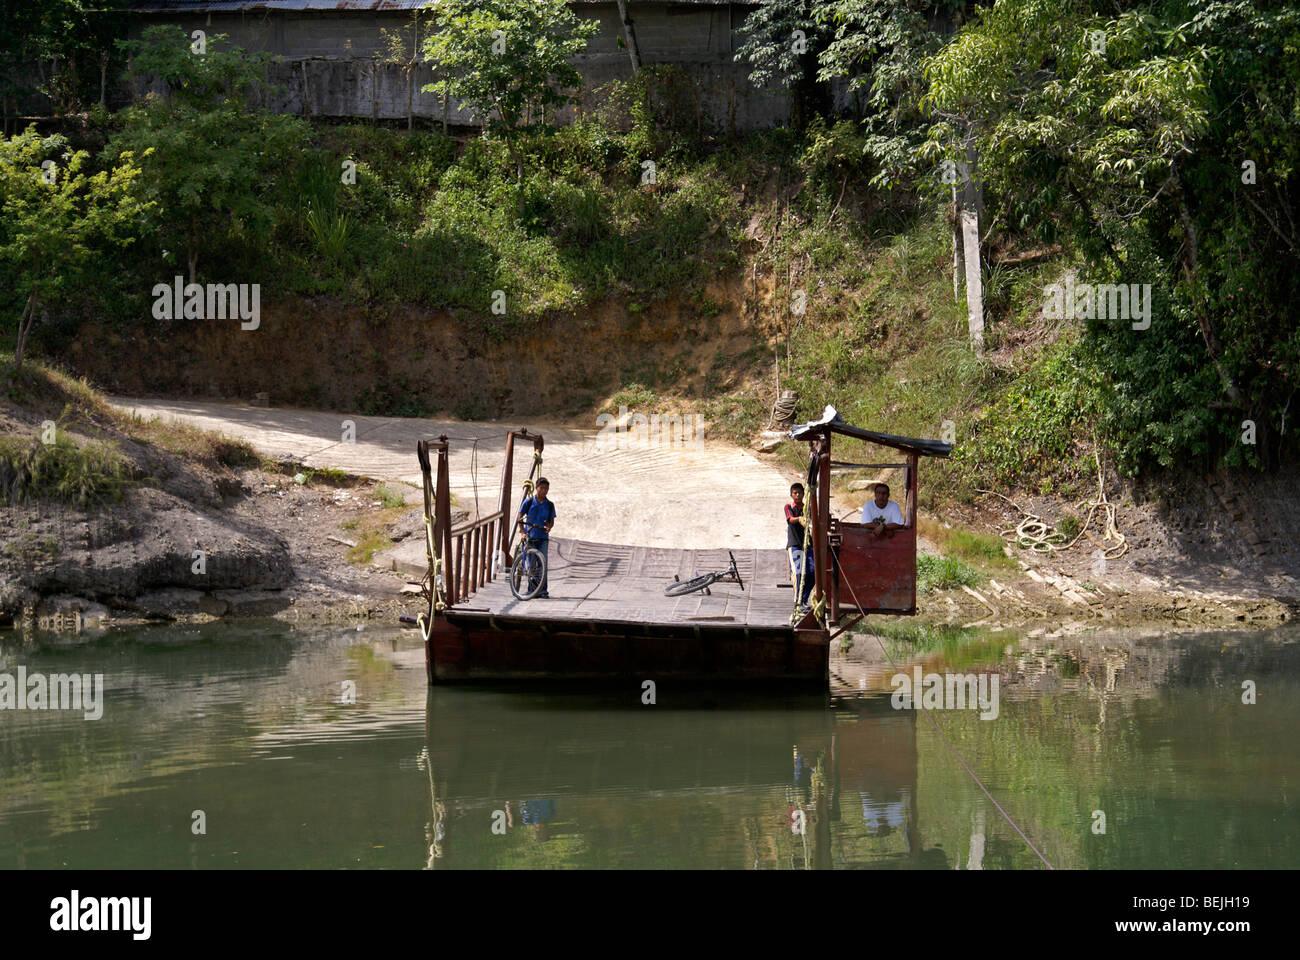 Hand operated river ferry near the town of Axtla de Terrazas, Huasteca region, San Luis Potosi state, Mexico - Stock Image